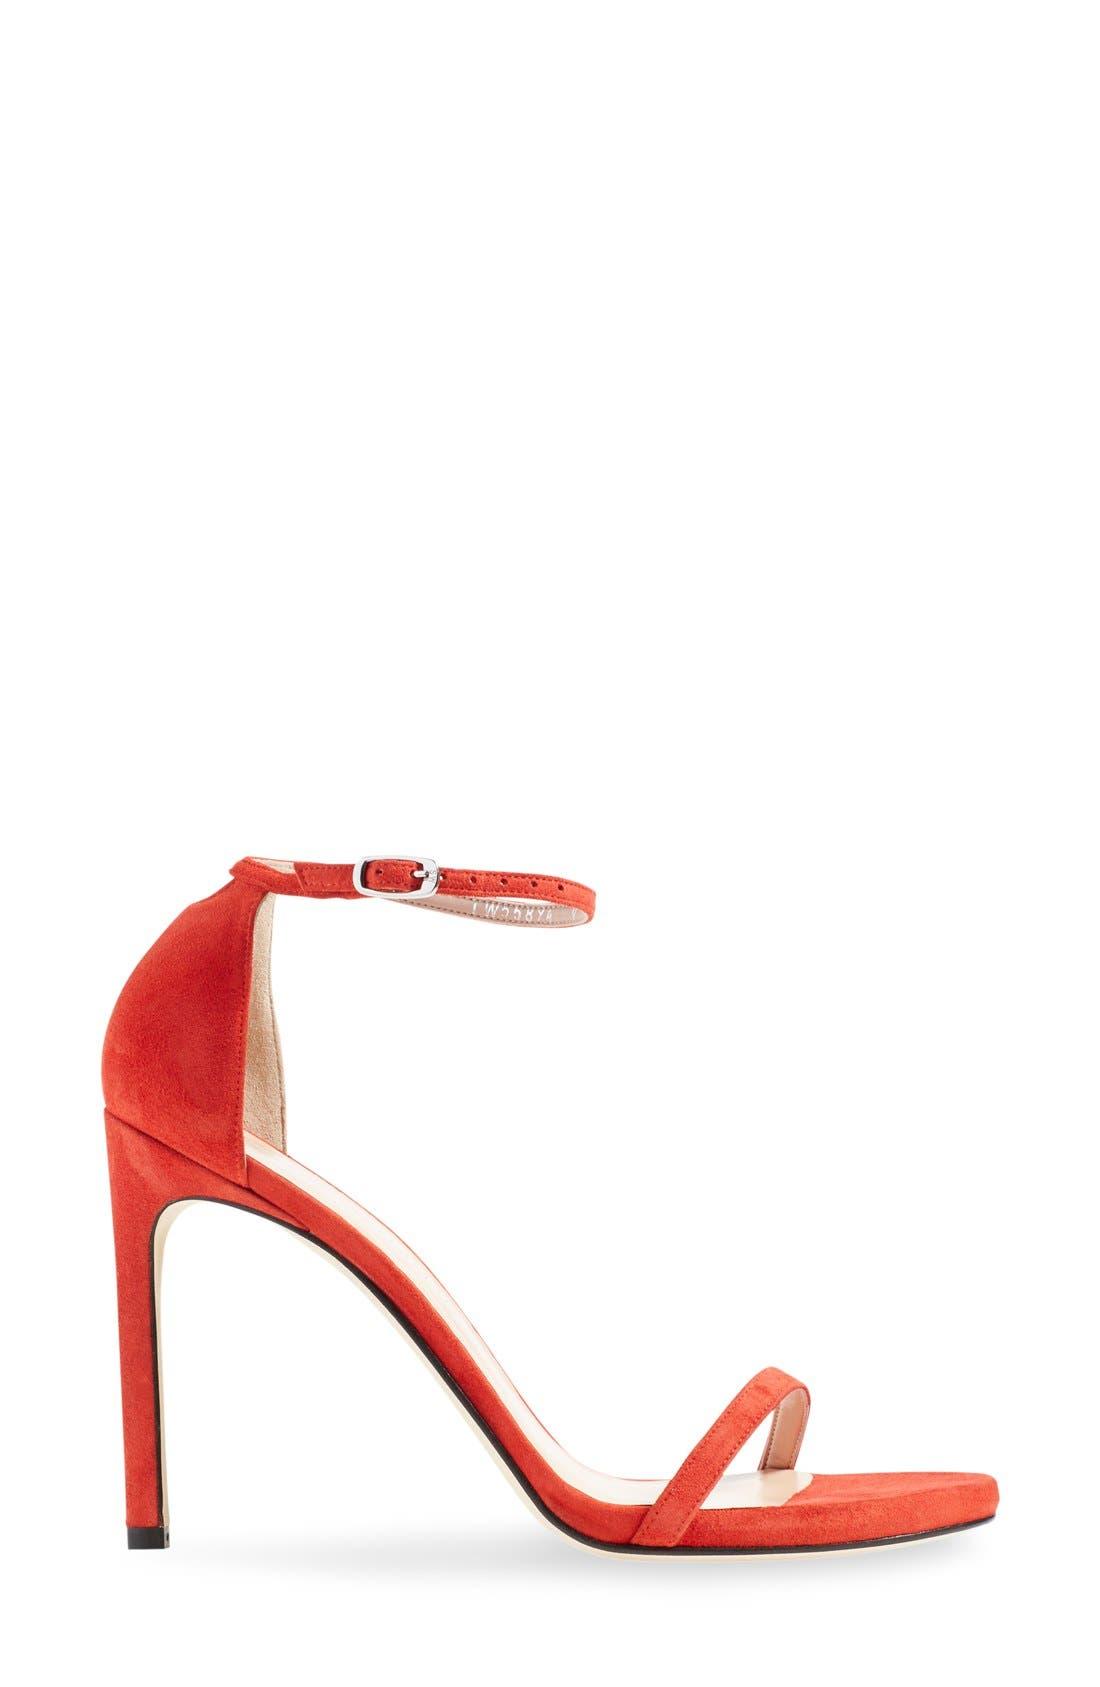 Nudistsong Ankle Strap Sandal,                             Alternate thumbnail 169, color,